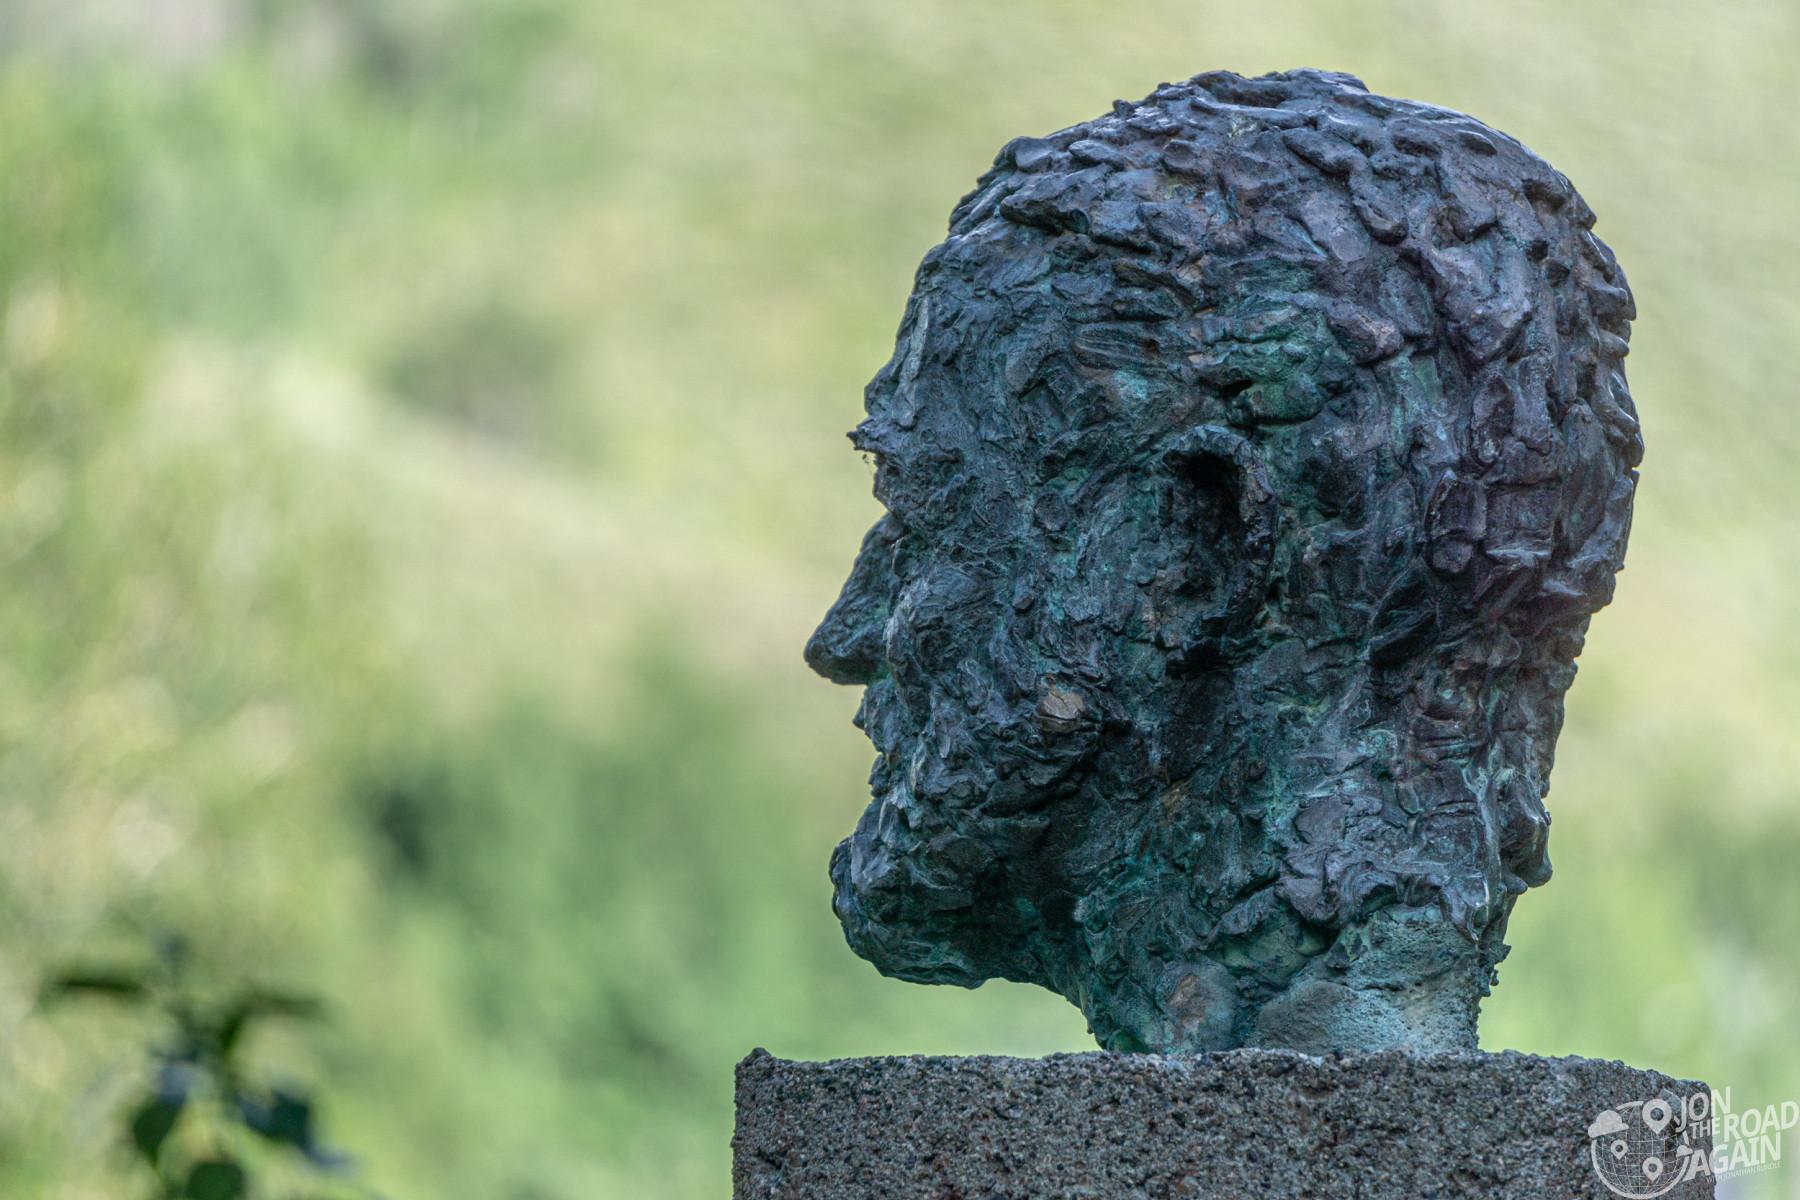 Ernest Hemingway Memorial bust